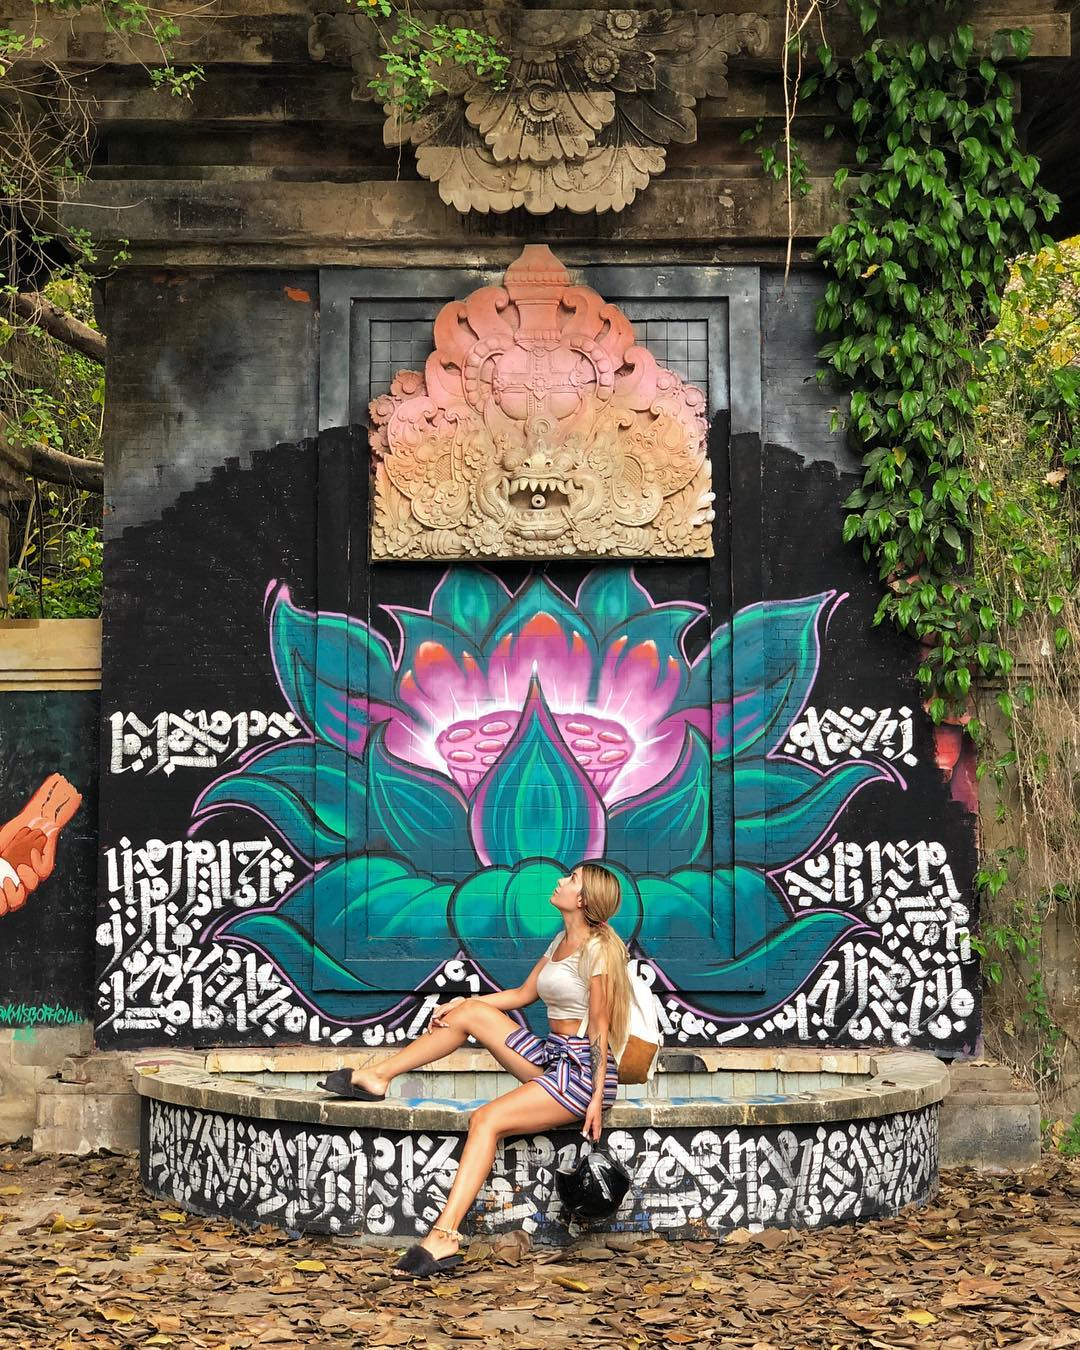 Taman festival sanur - insight bali